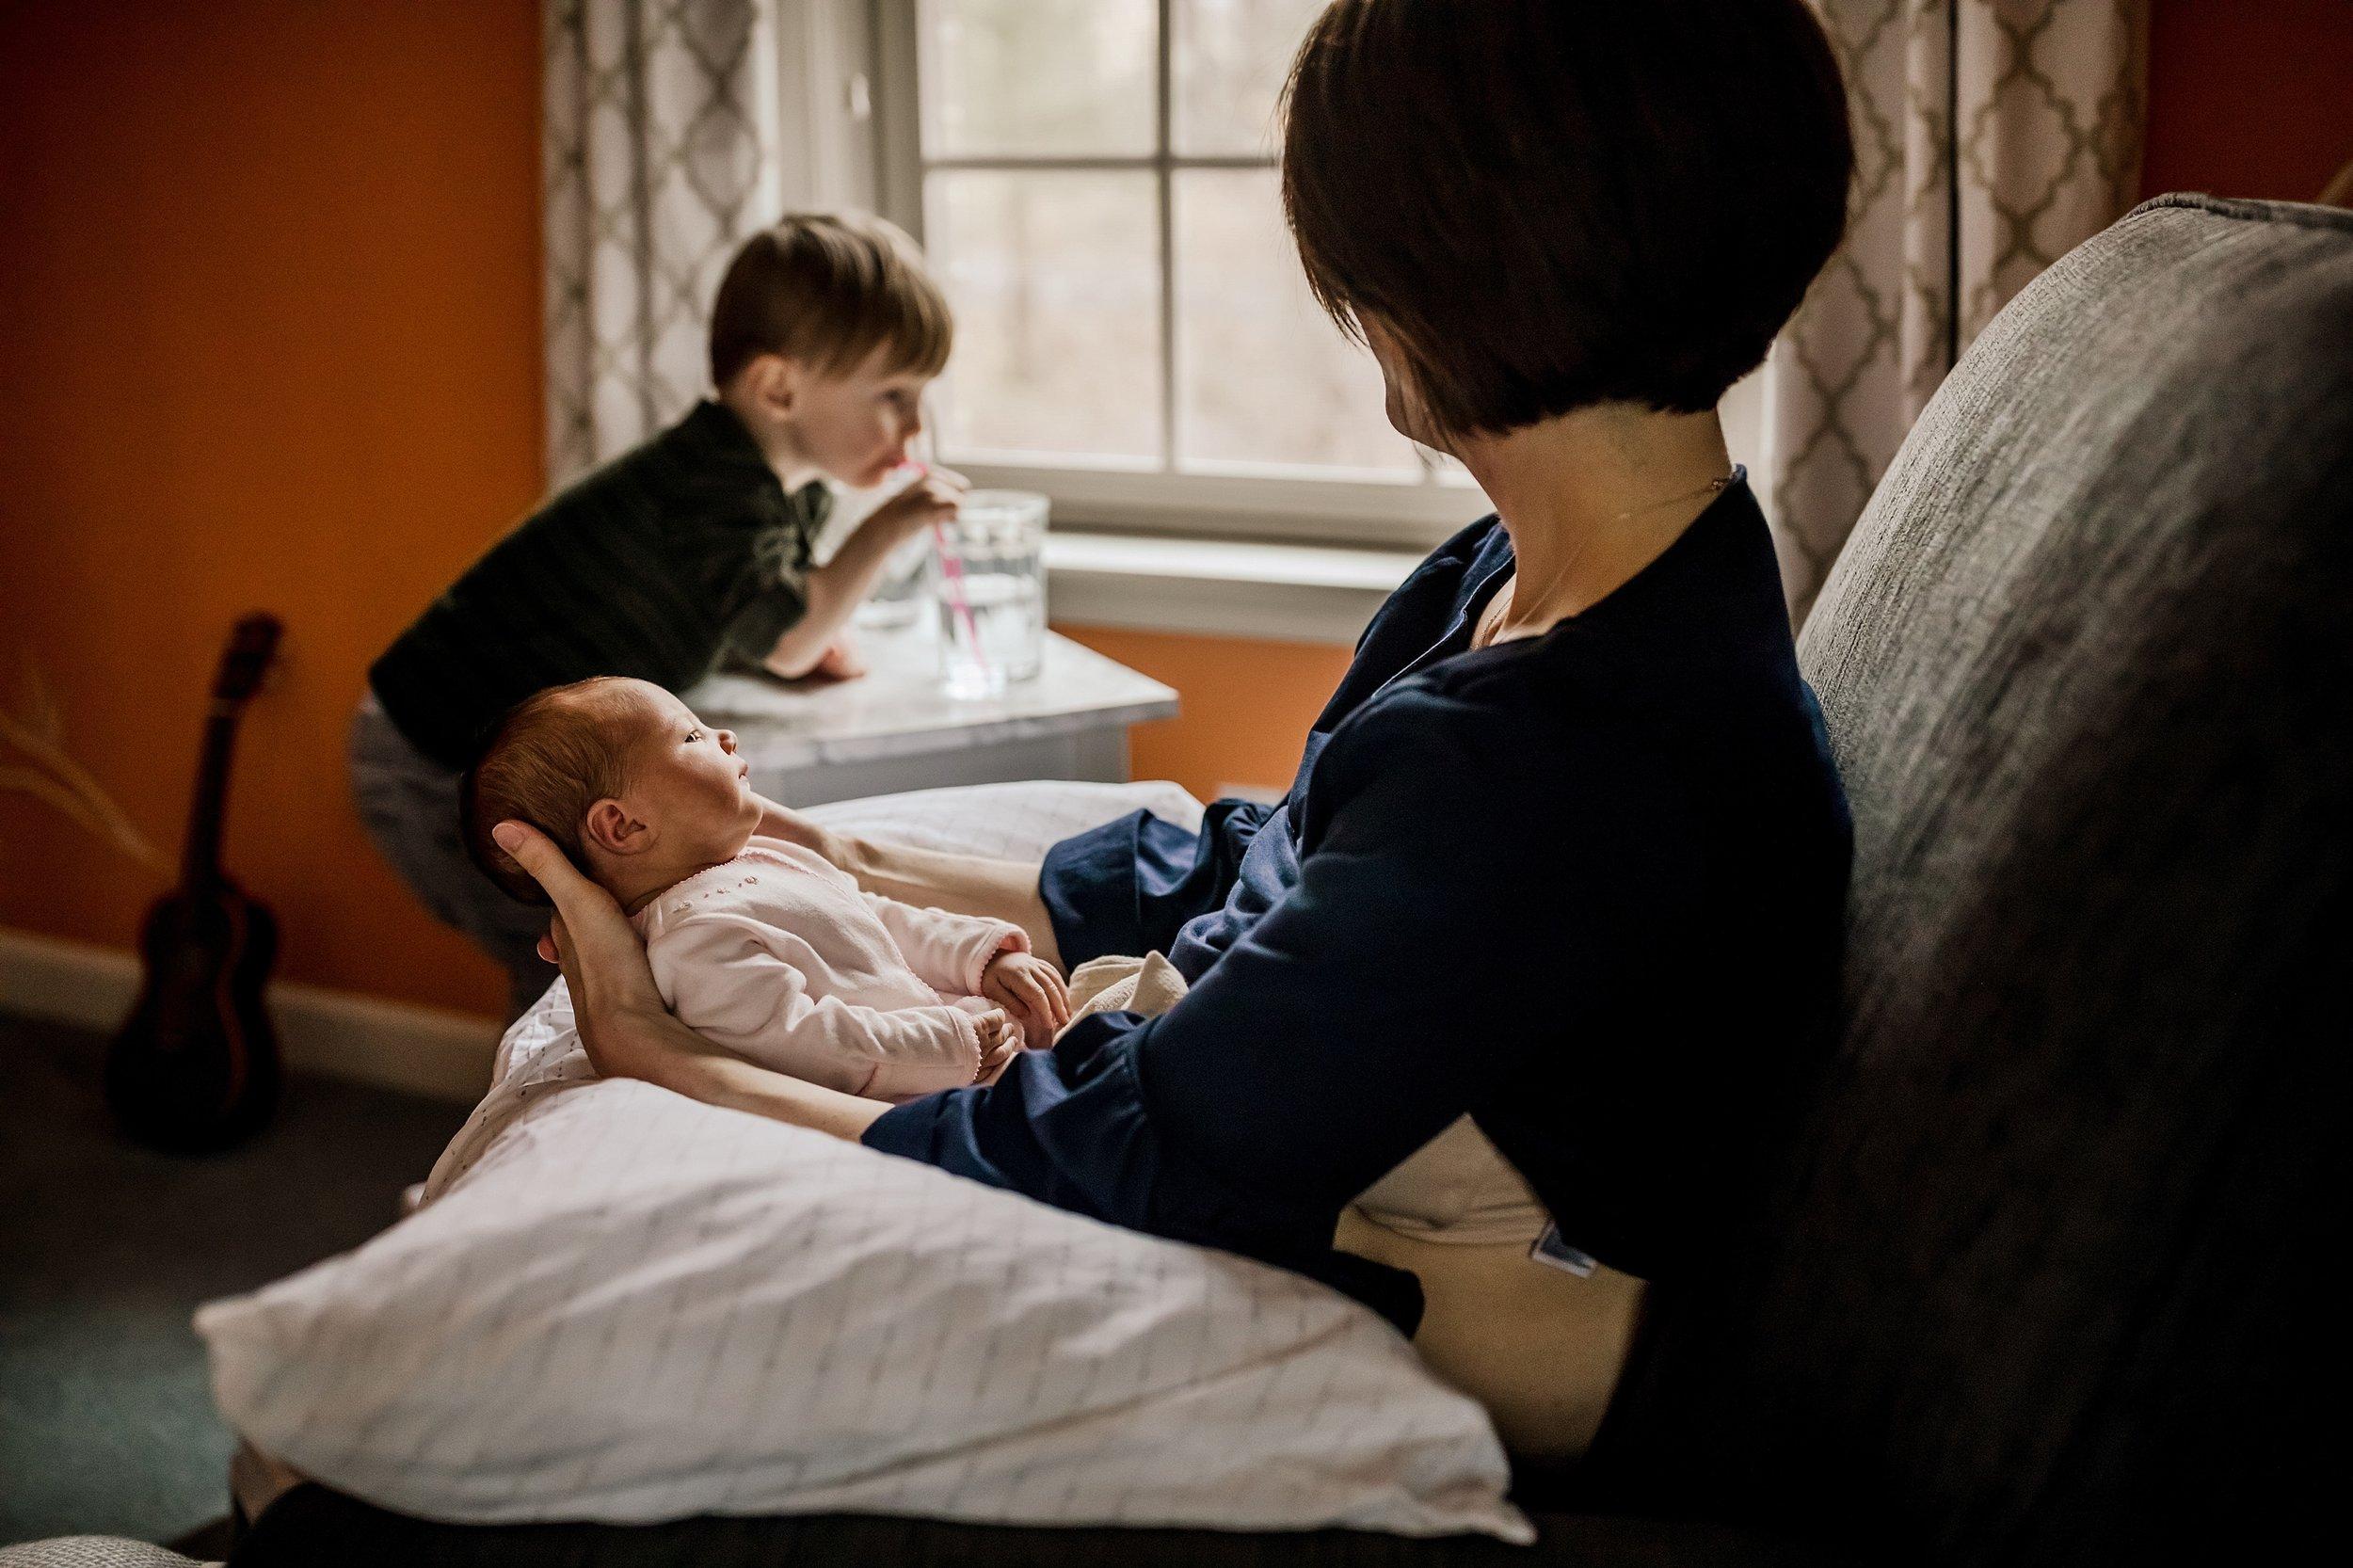 Lehigh-Valley-Newborn-Documentary-Photographer_0044.jpg